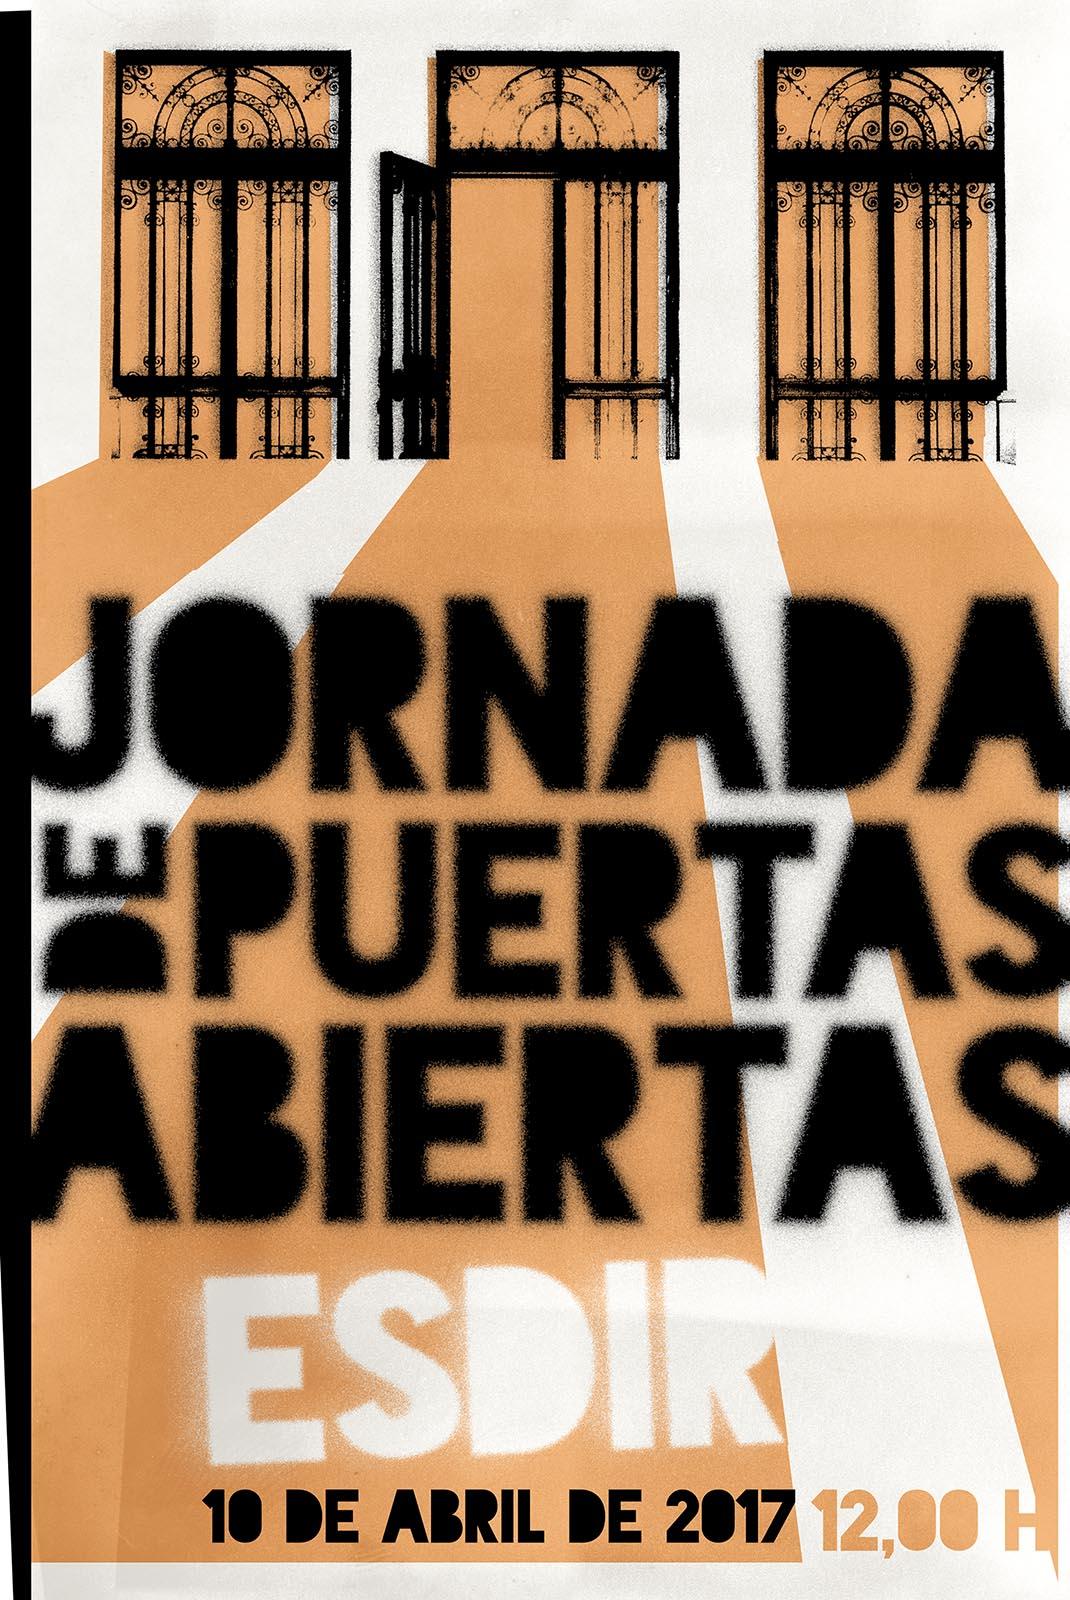 JORNADA PUERTAS ABIERTAS